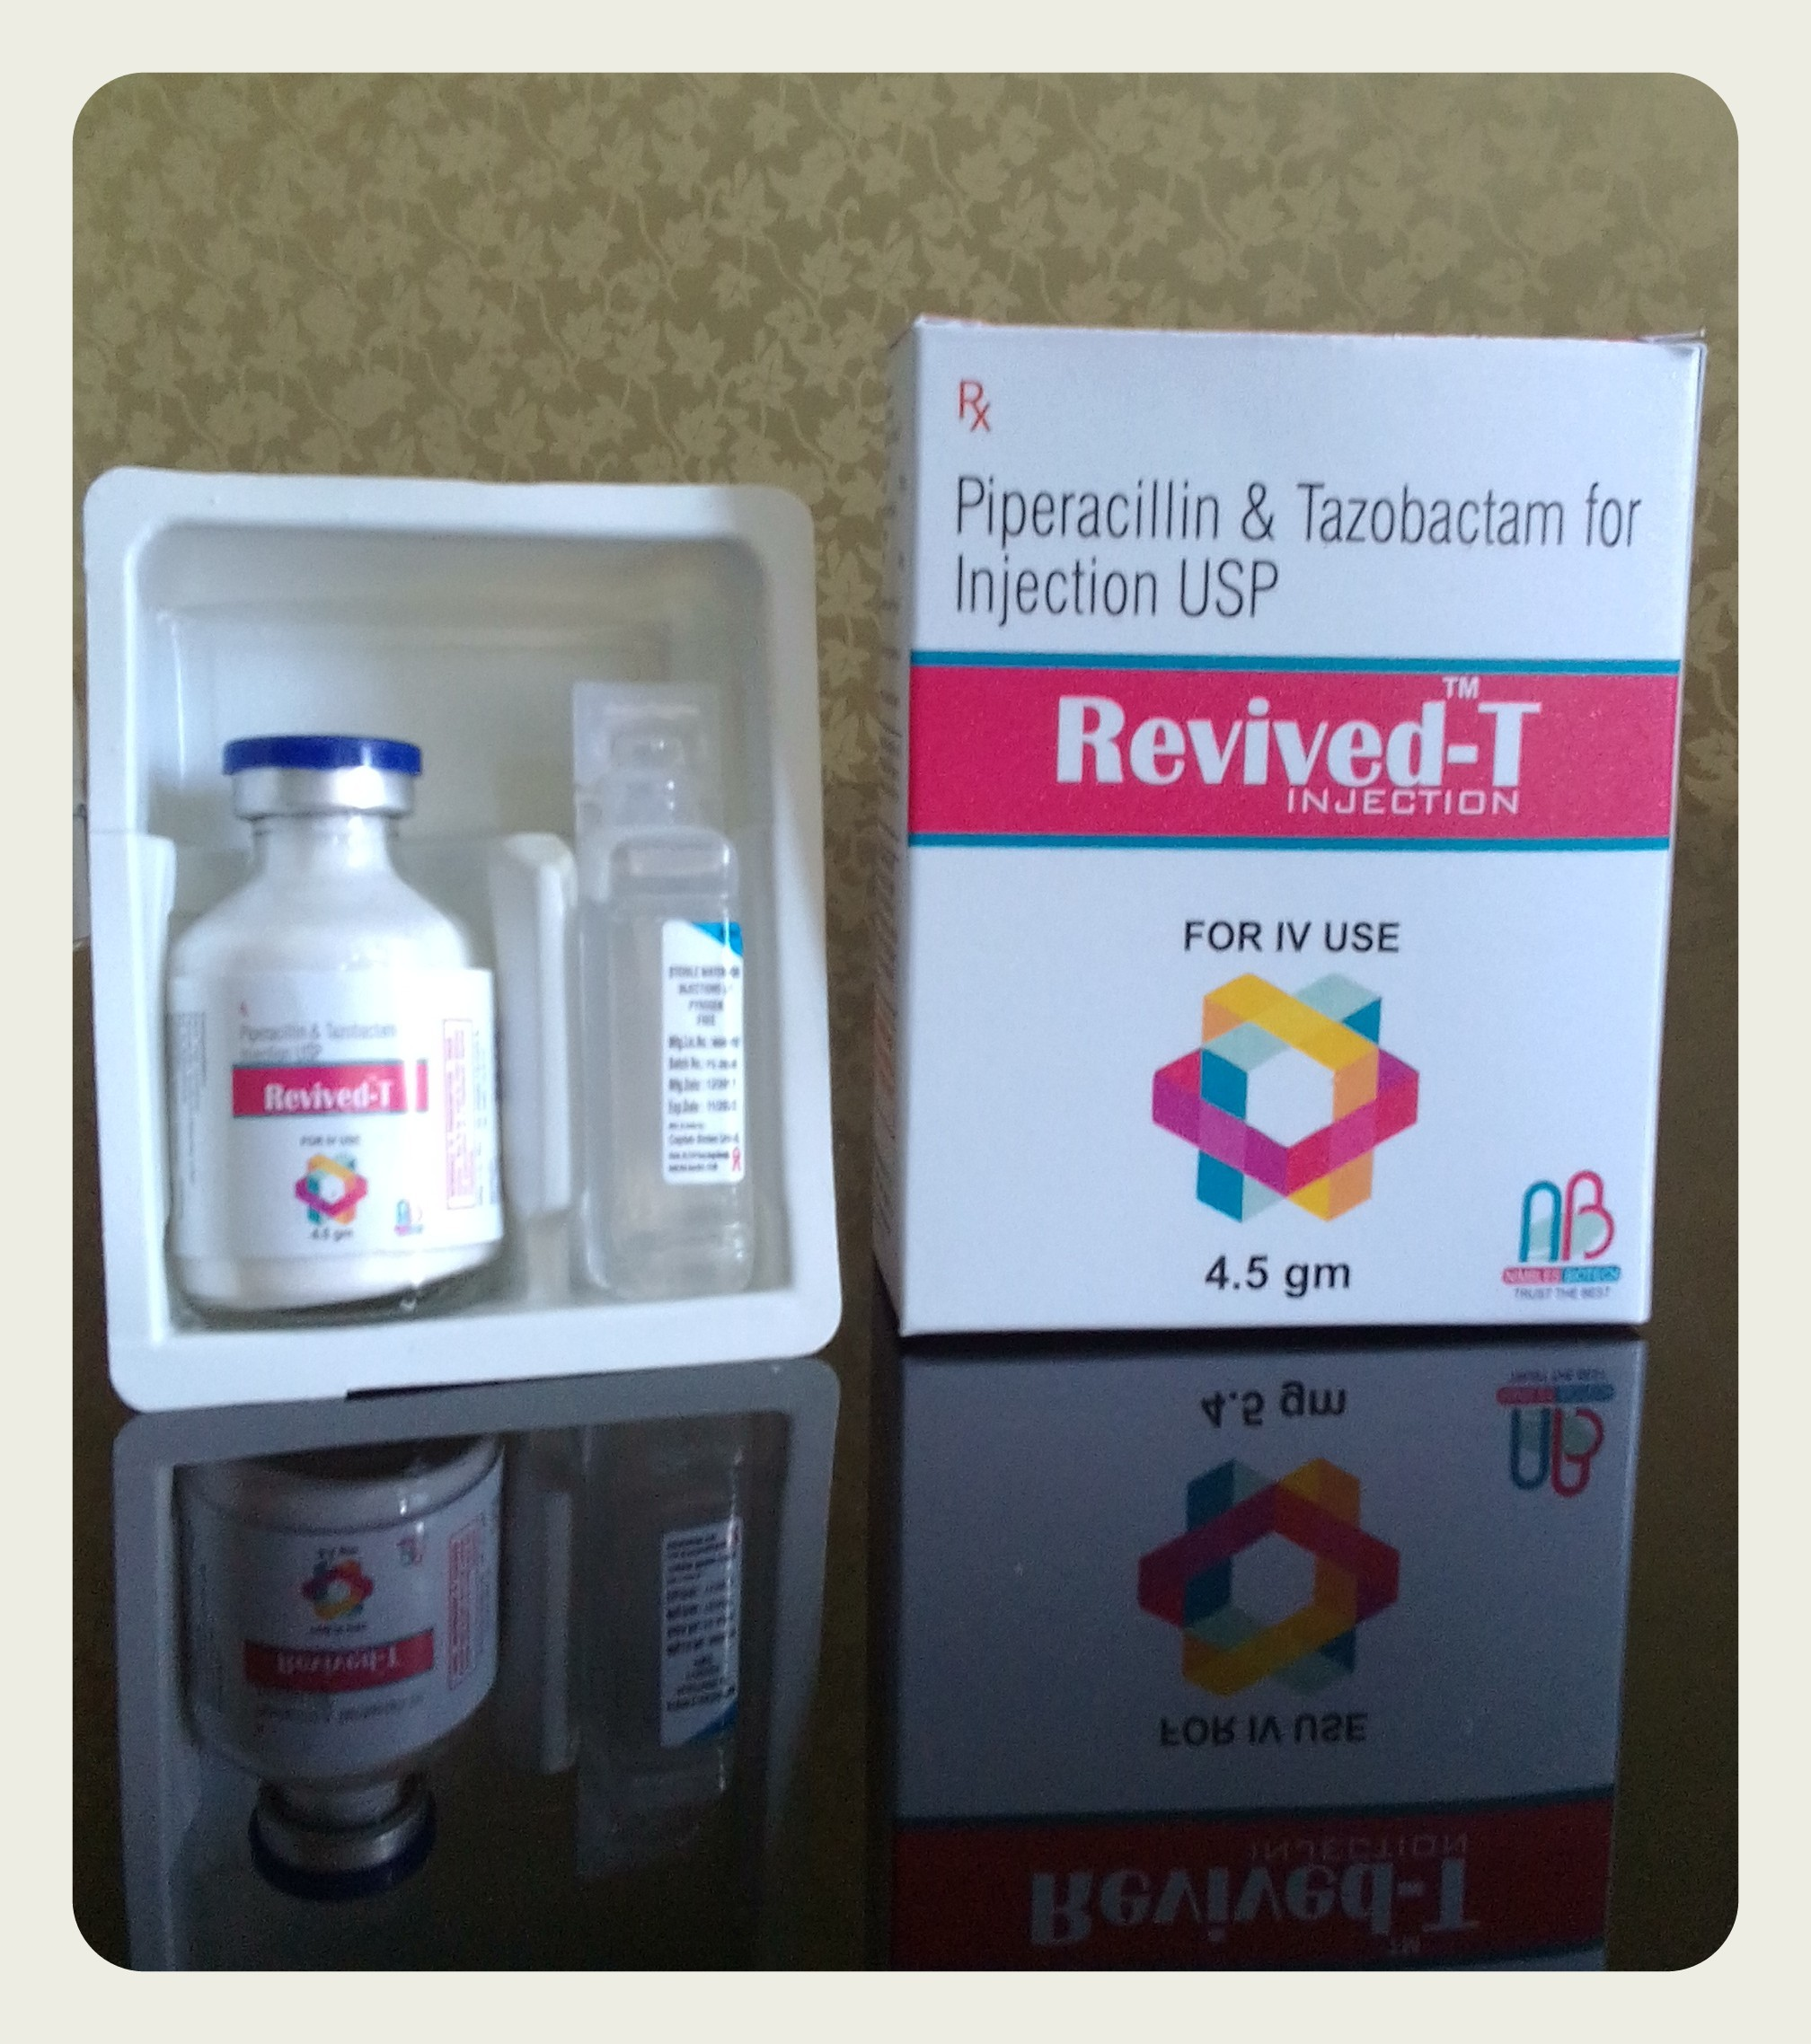 Piperacillin & Tazobactam Injection